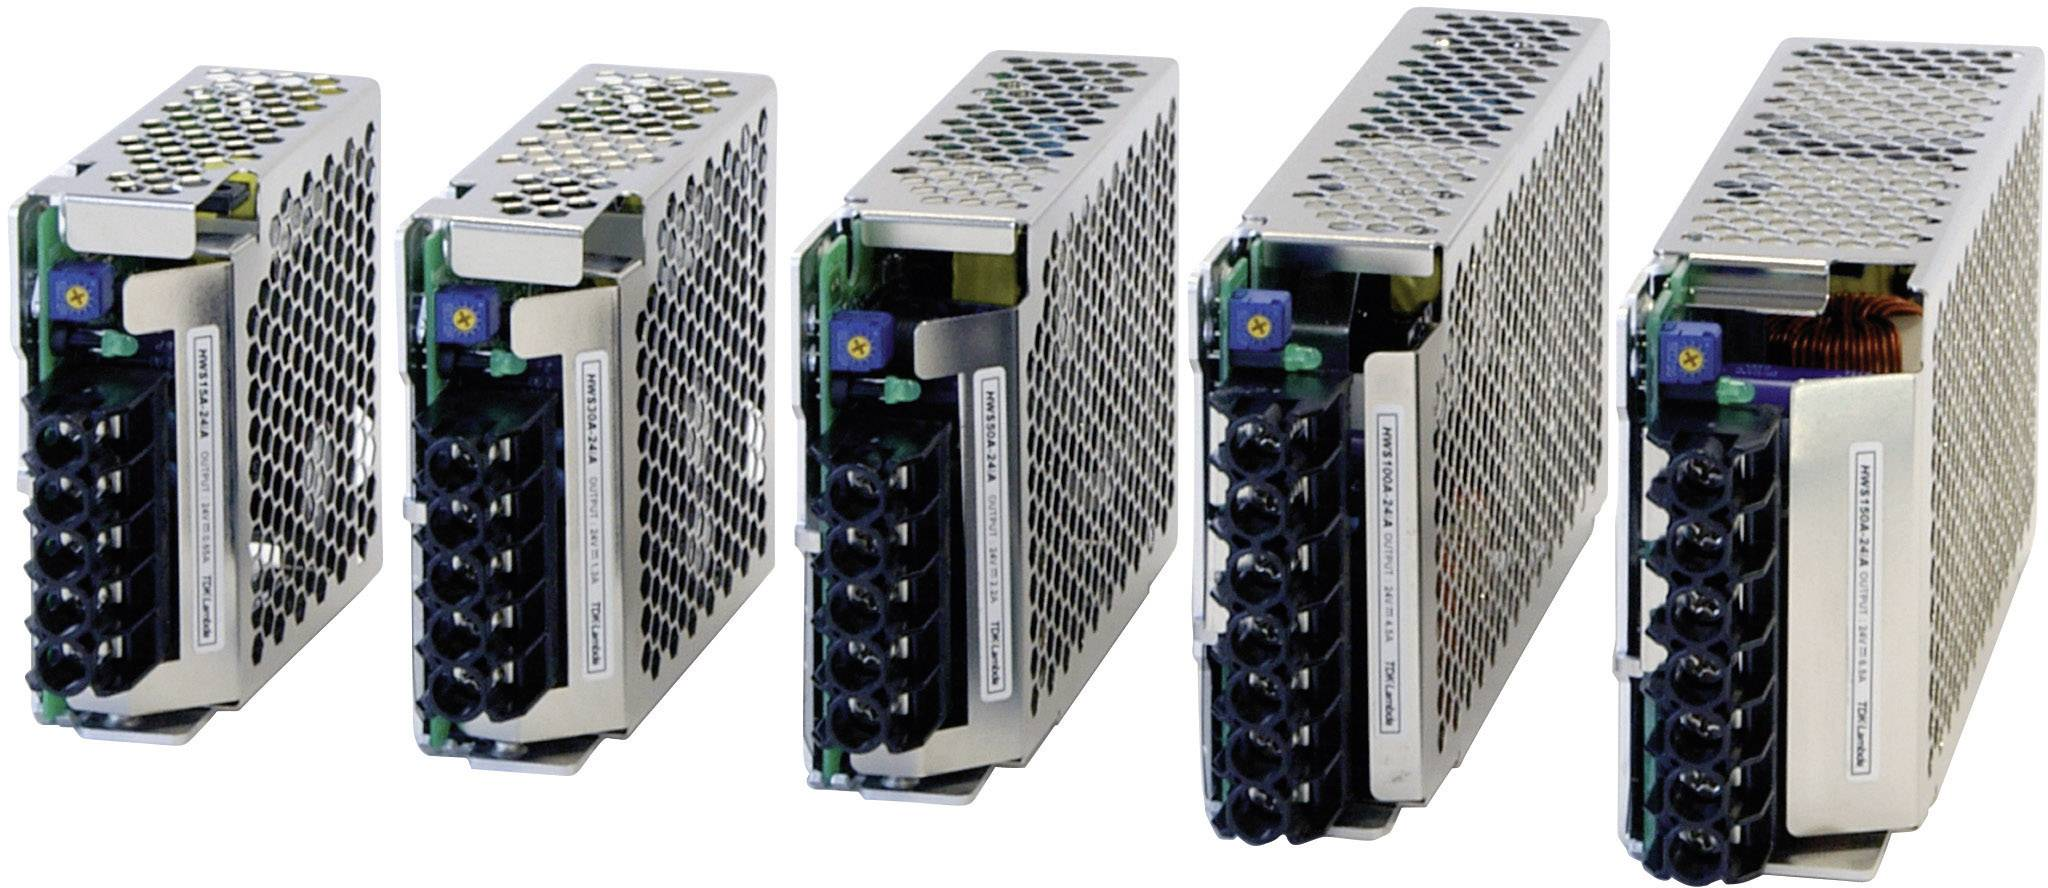 Zabudovateľný napájací zdroj TDK-Lambda HWS-50A-3/A, 3,3 V, 33 W